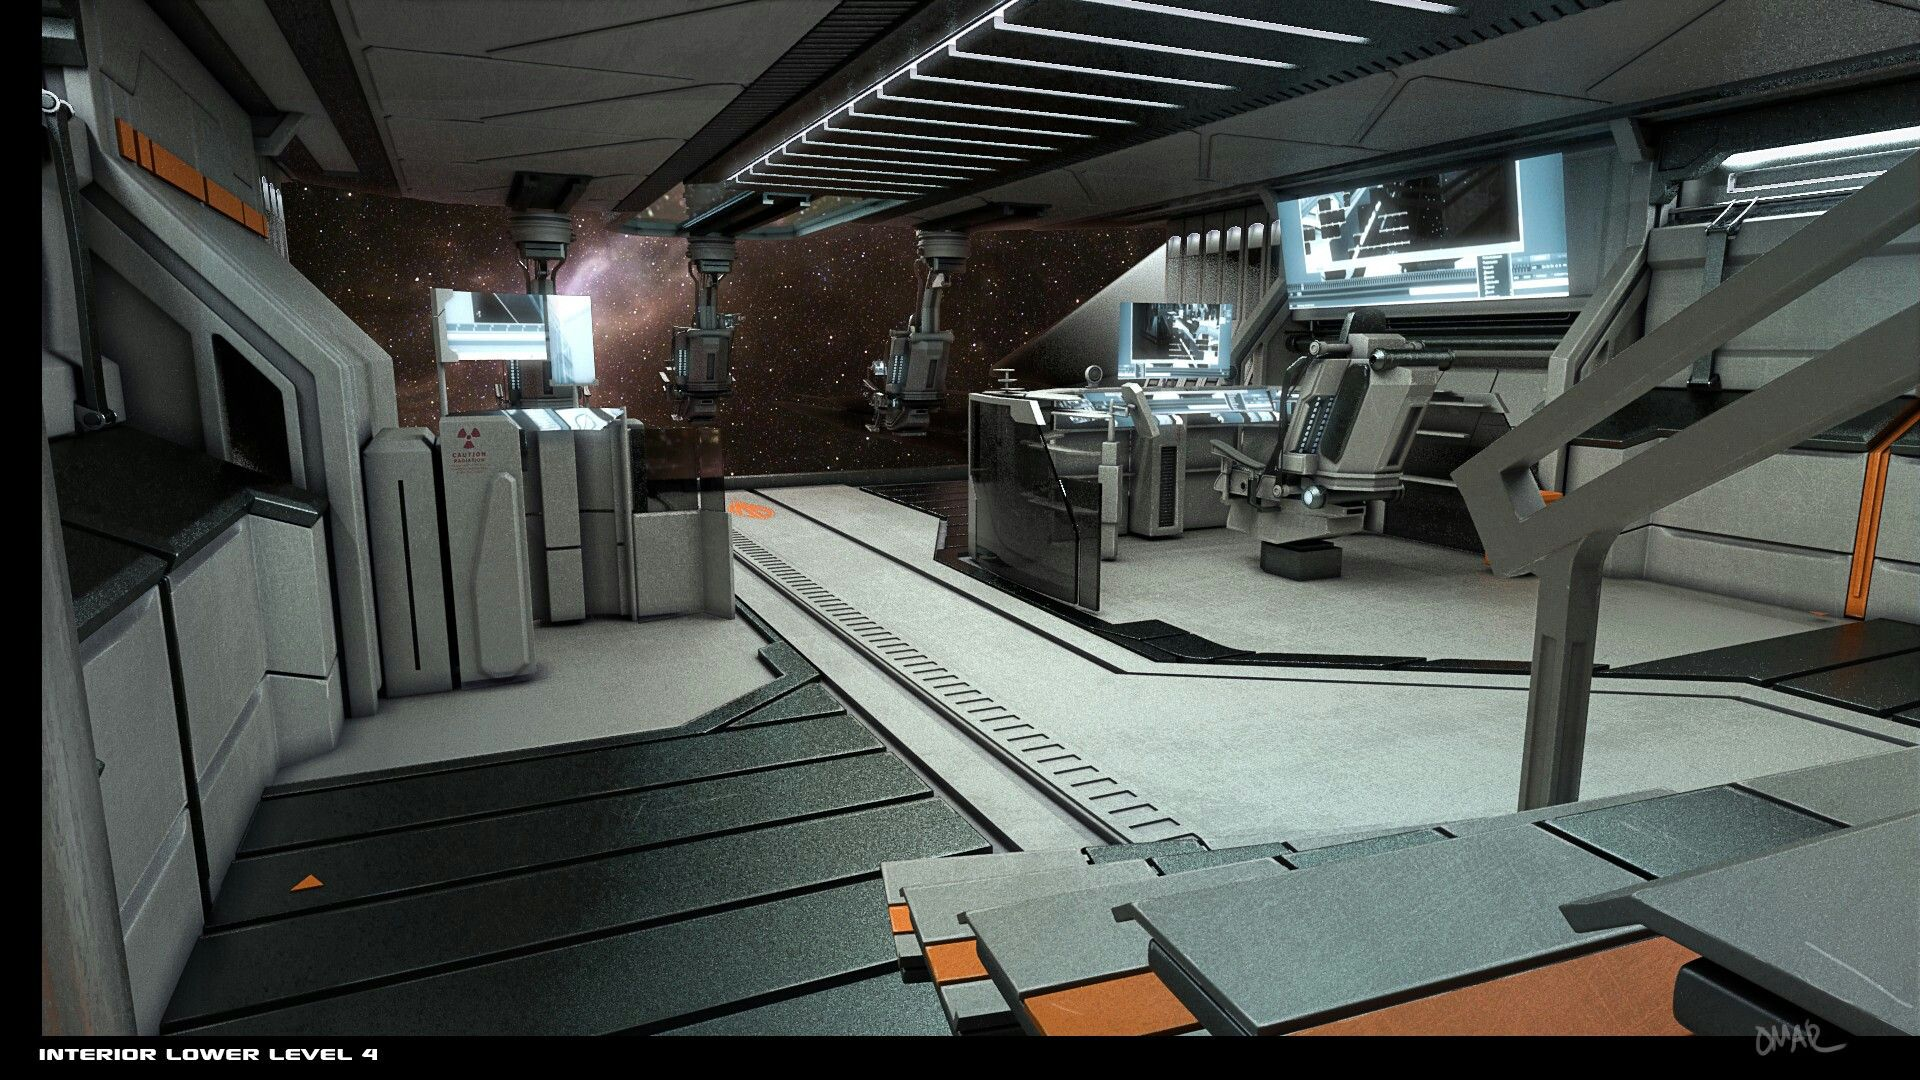 star citizen carrack bridge spaceship and vehicle concepts and mech ideas pinterest. Black Bedroom Furniture Sets. Home Design Ideas